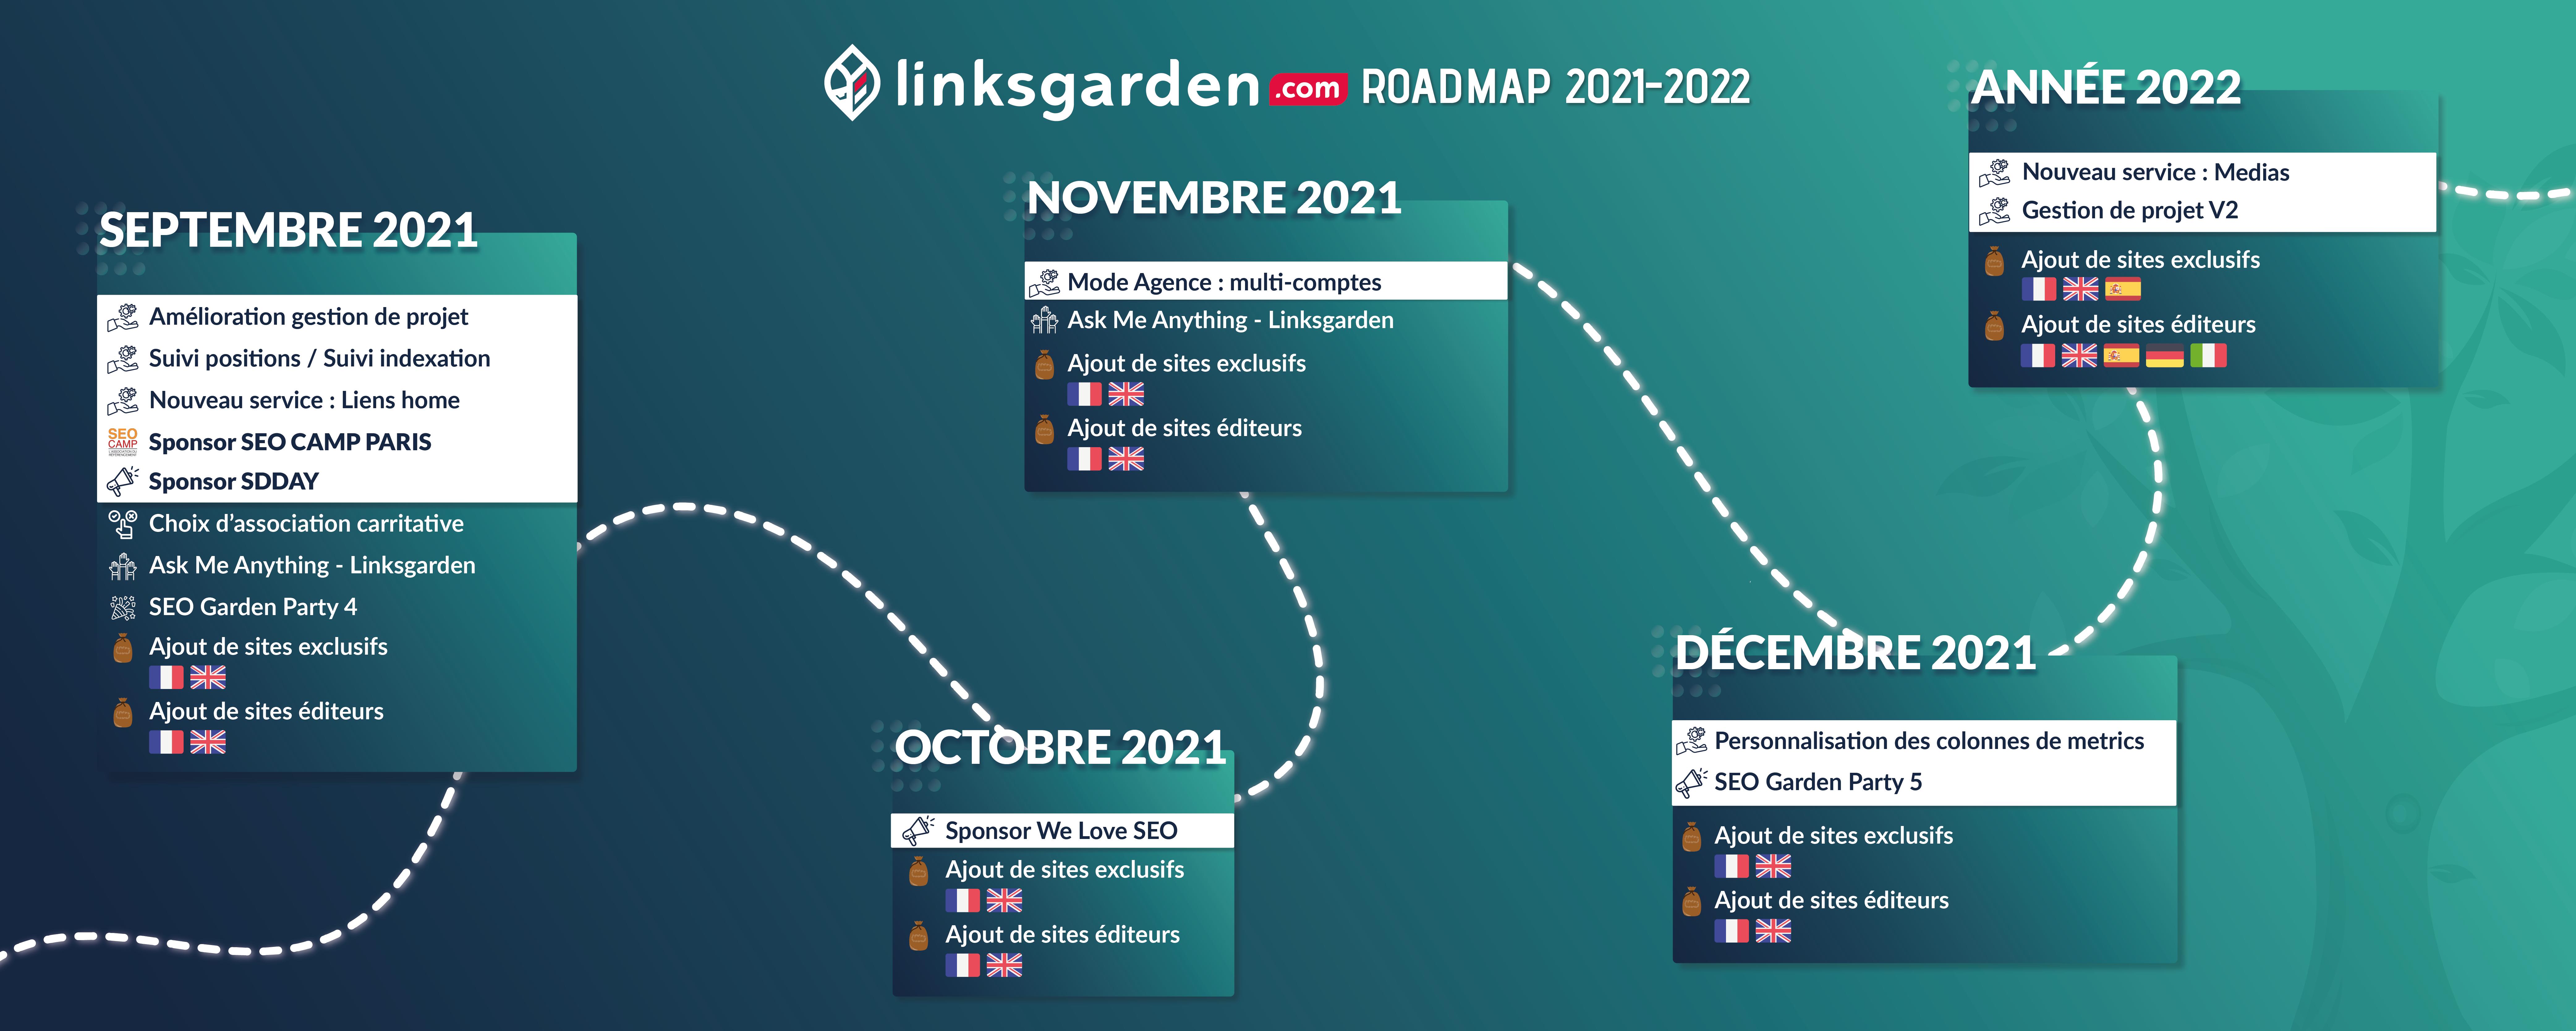 Roadmap Linksgarden 2021-2022